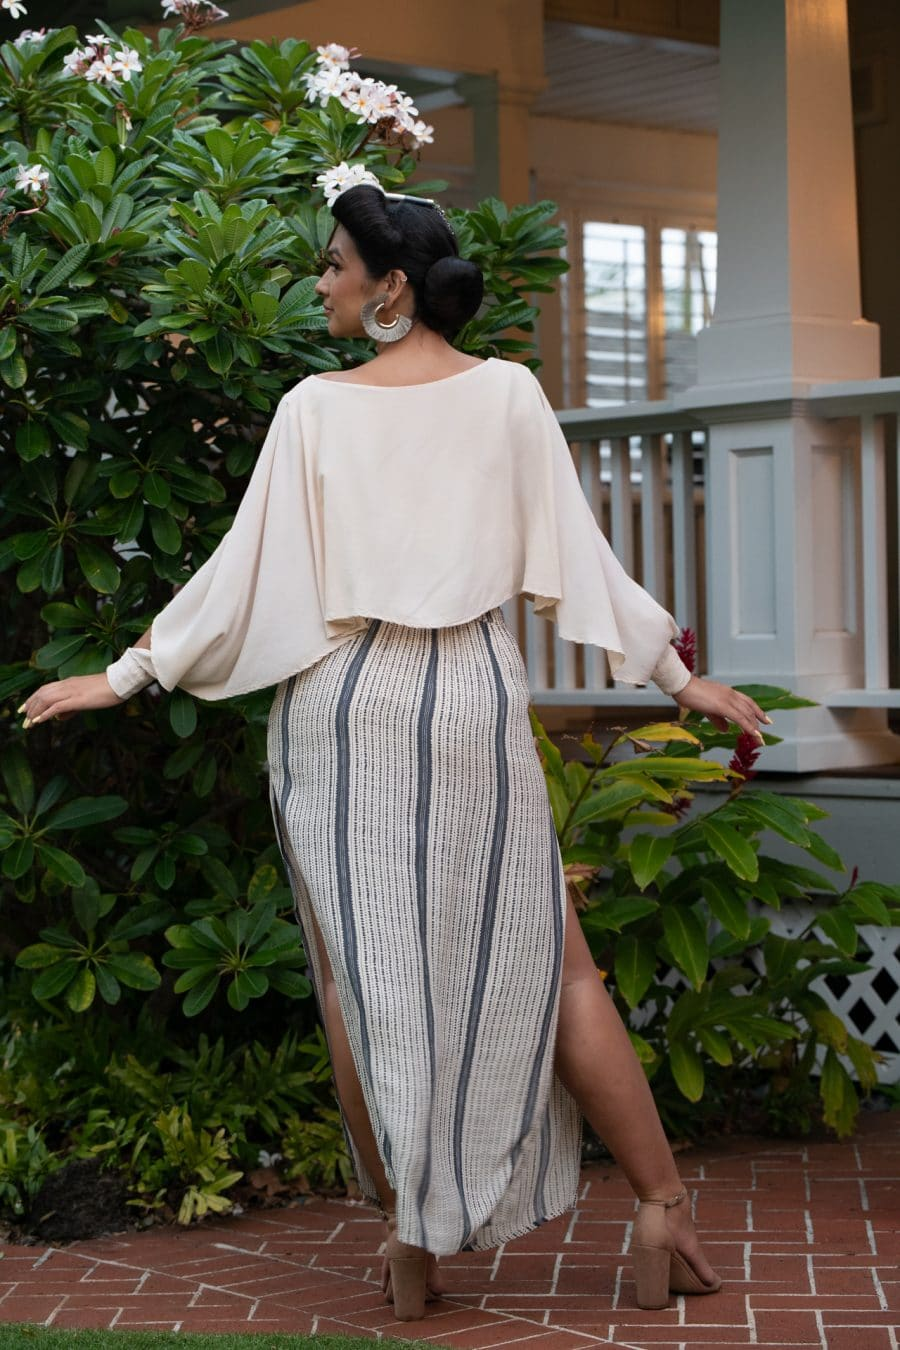 Model wearing Kahiki Skirt Long in Pavement Moonbeam Hoonionio Pattern - Back View